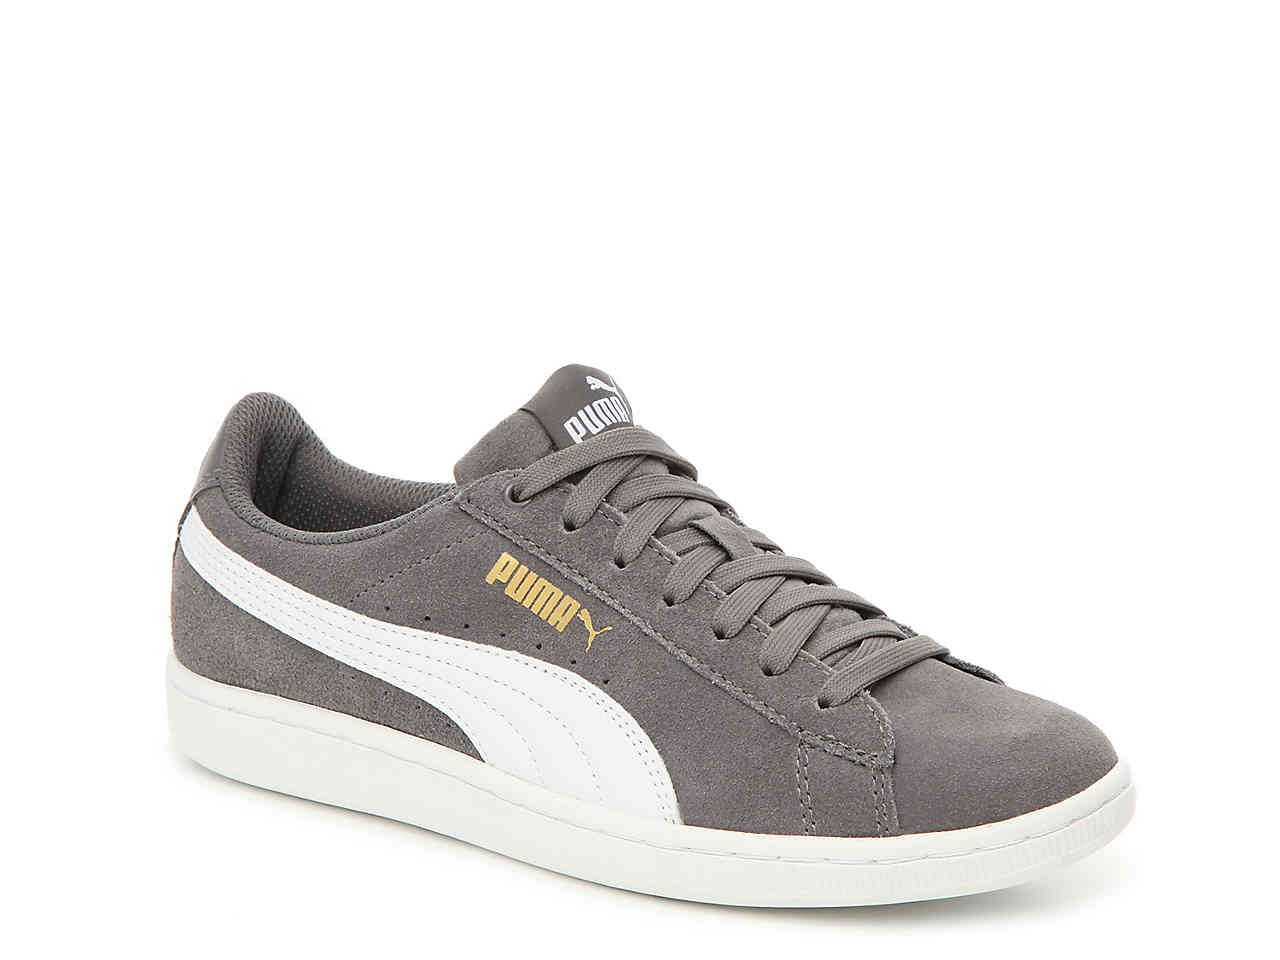 Puma Vikky Lo Suede Sneaker - Women s Women s Shoes  afd02aecfb00